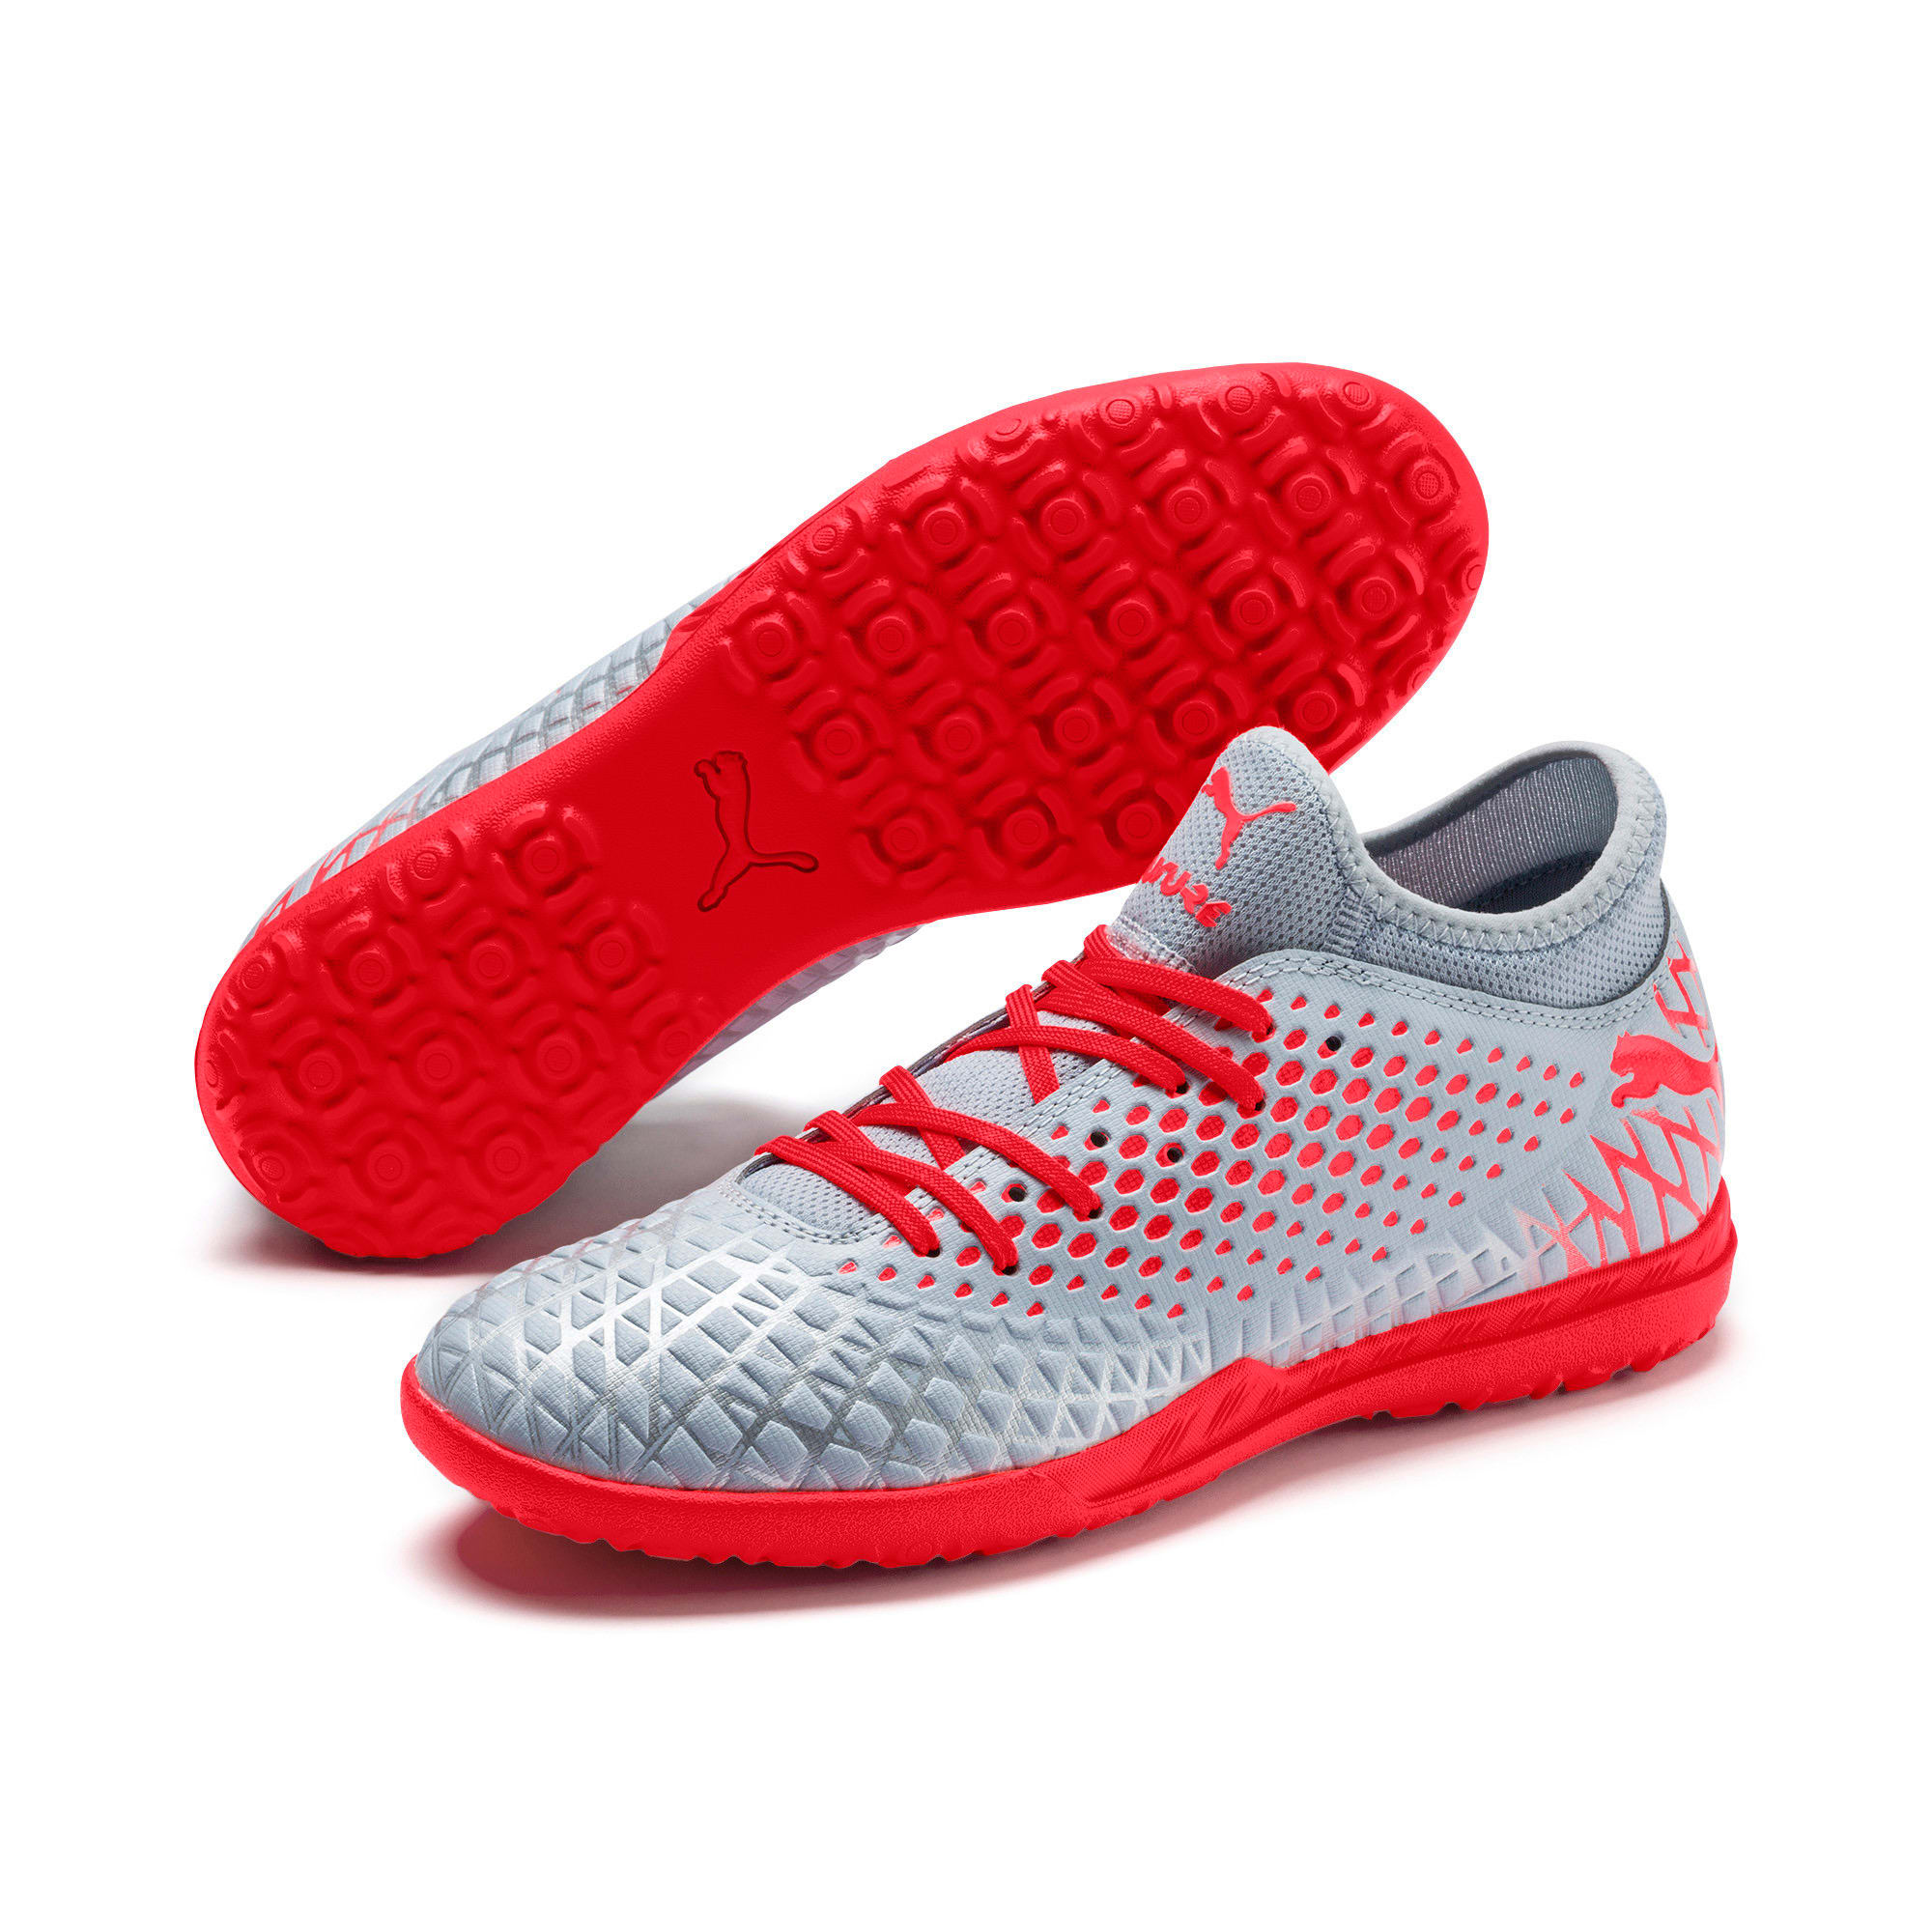 Thumbnail 3 of FUTURE 4.4 TT Men's Soccer Shoes, Glacial Blue-Nrgy Red, medium